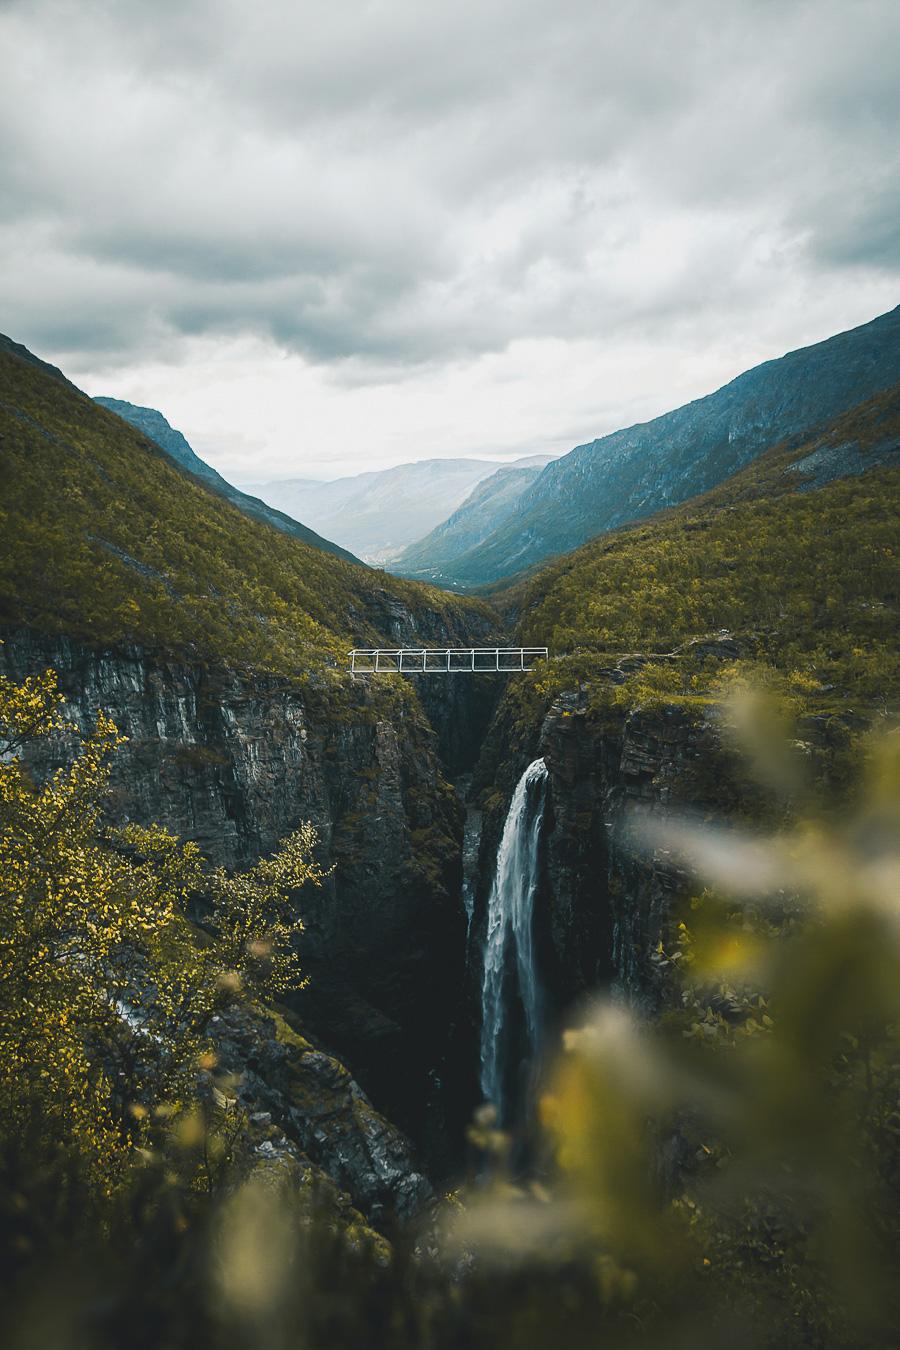 Waterfall dropping 120m under a white bridge